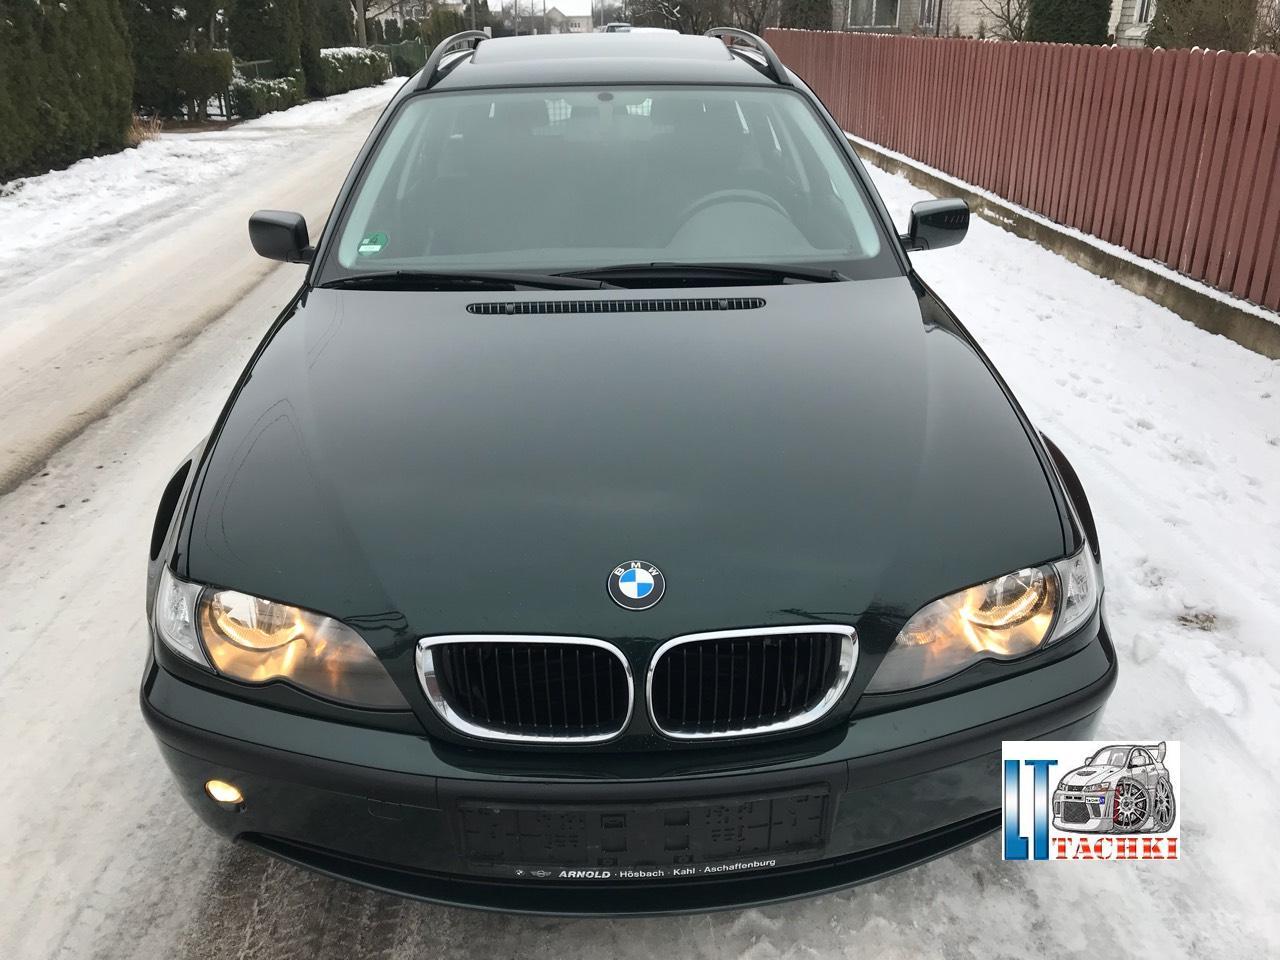 BMW 3er 320d E46 11/2002 г. Exclusive 5-cт. МЕХ